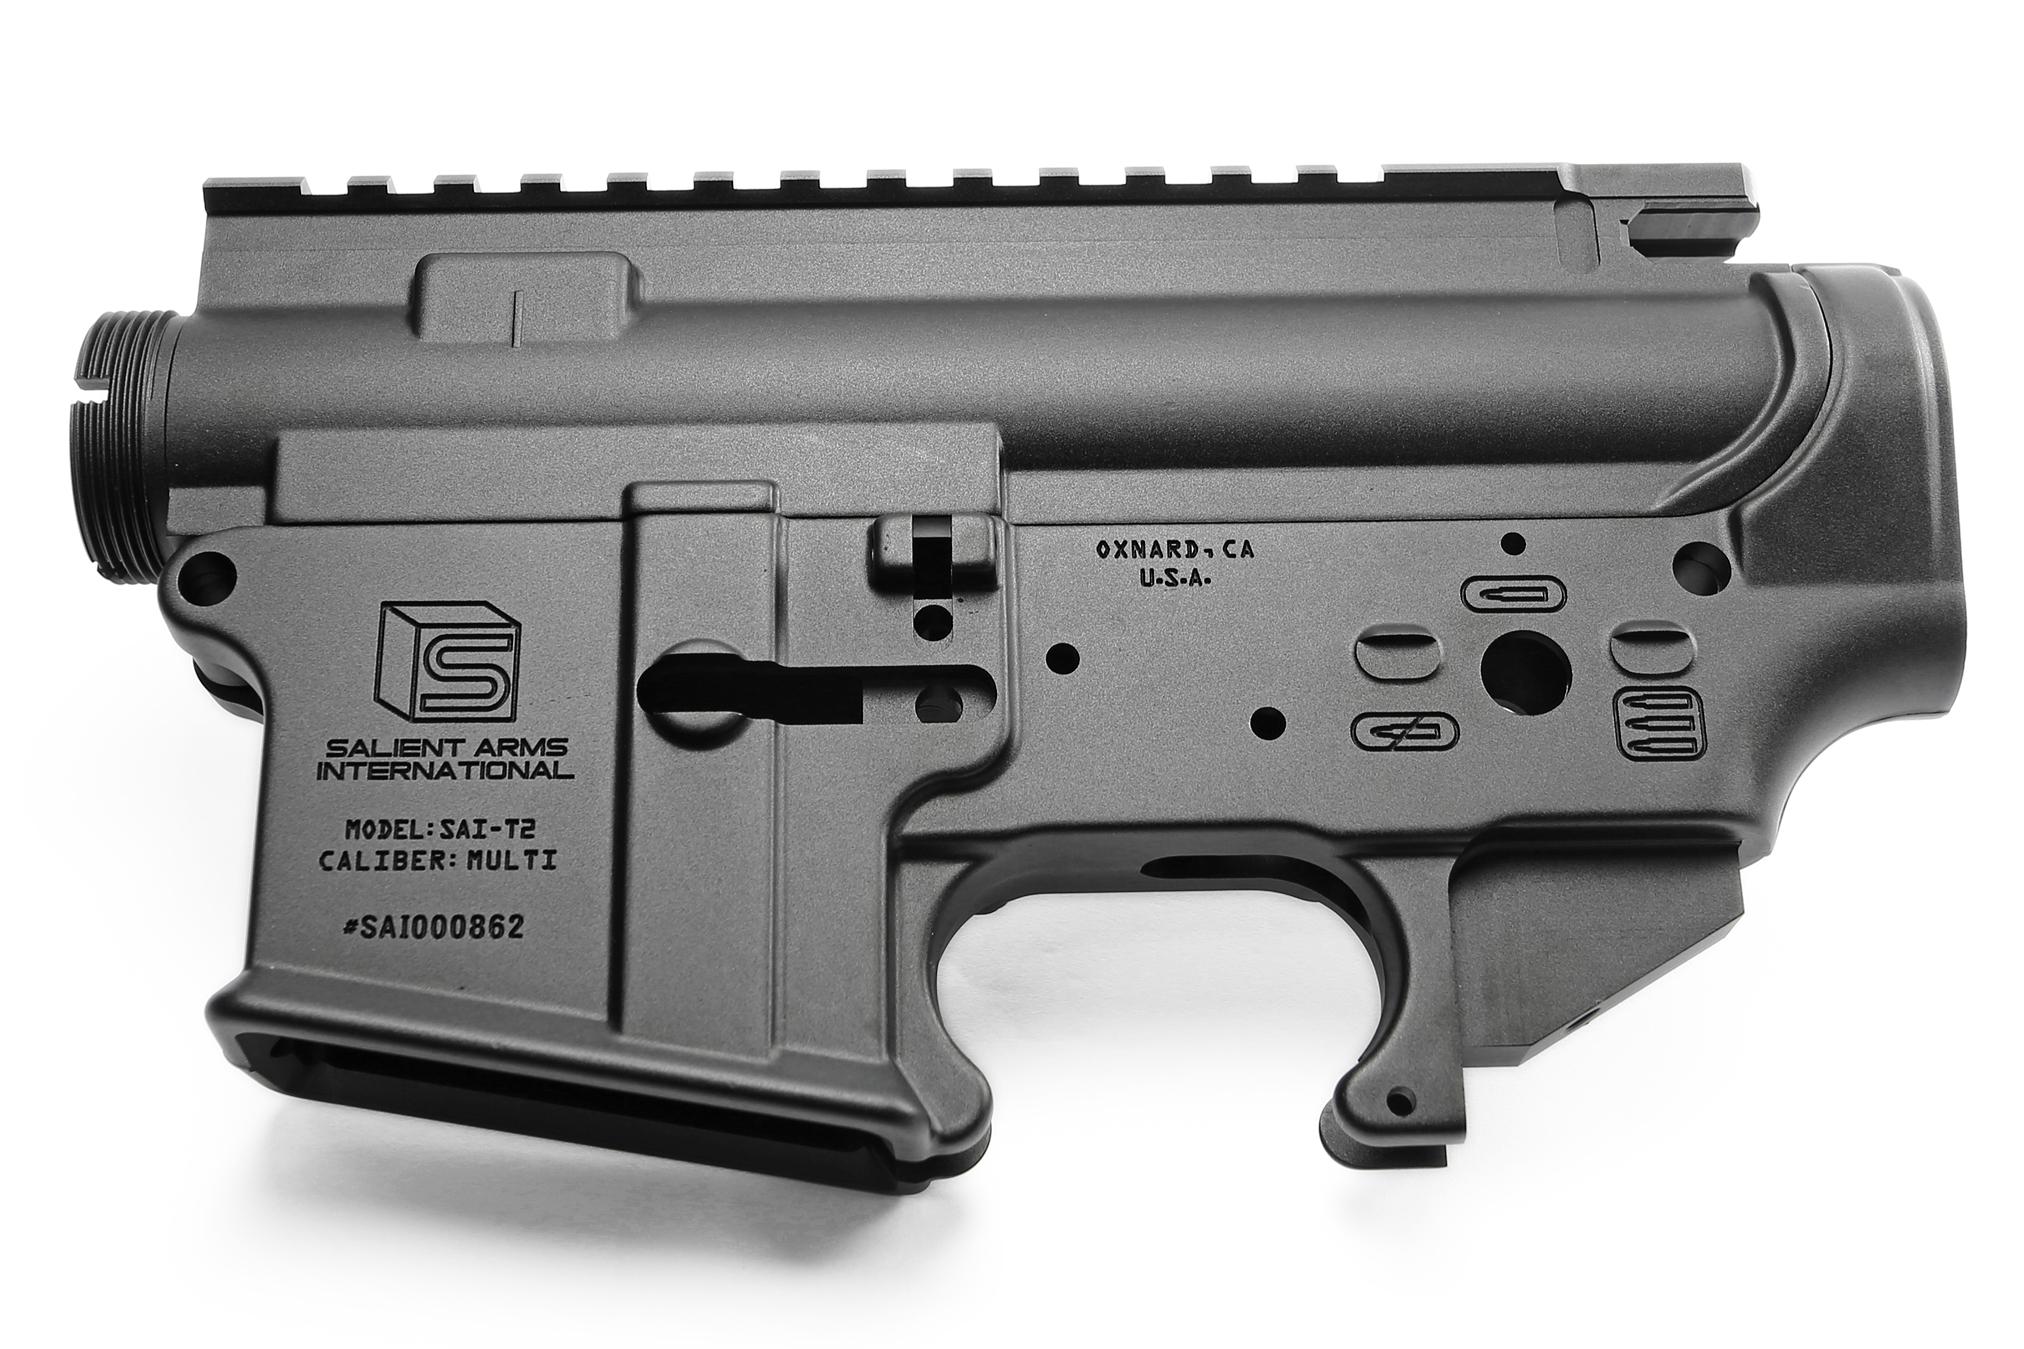 RA-TECH 鍛造アルミレシーバーセット Salient Arms International Ver.(RAG-WE--223)